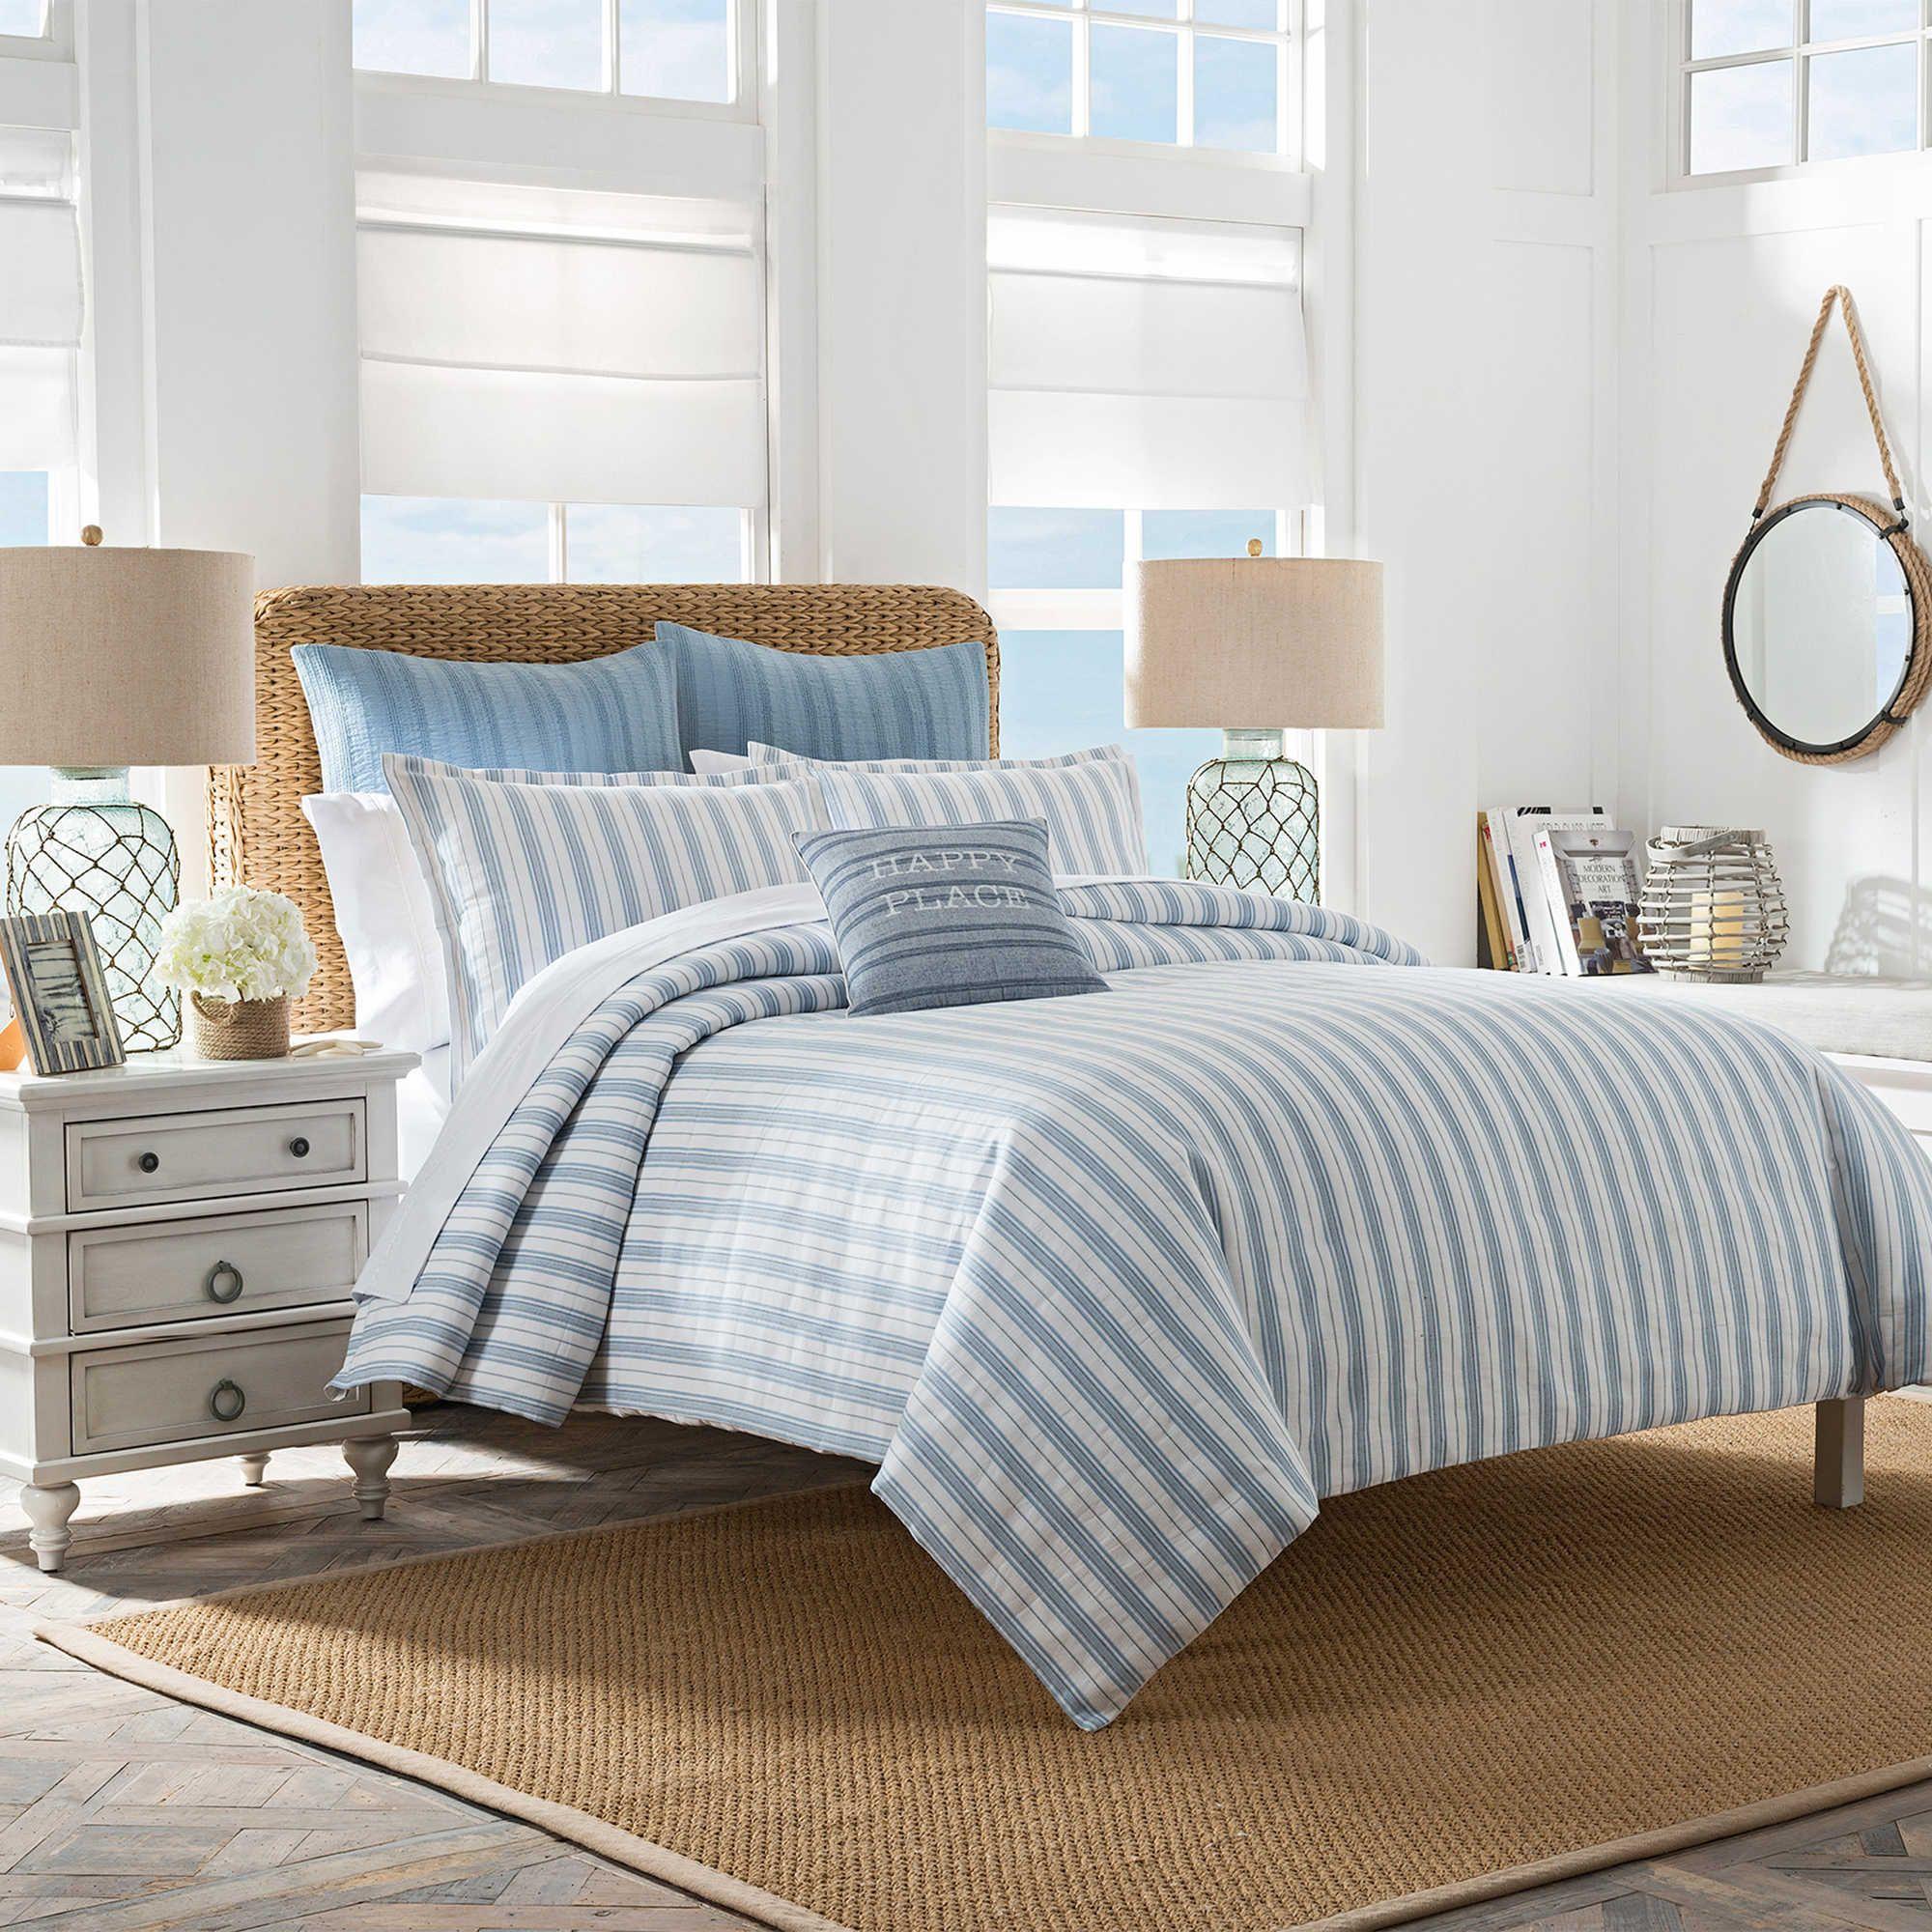 Shop Coastal Nautical Bedding Collections Bed Decor Striped